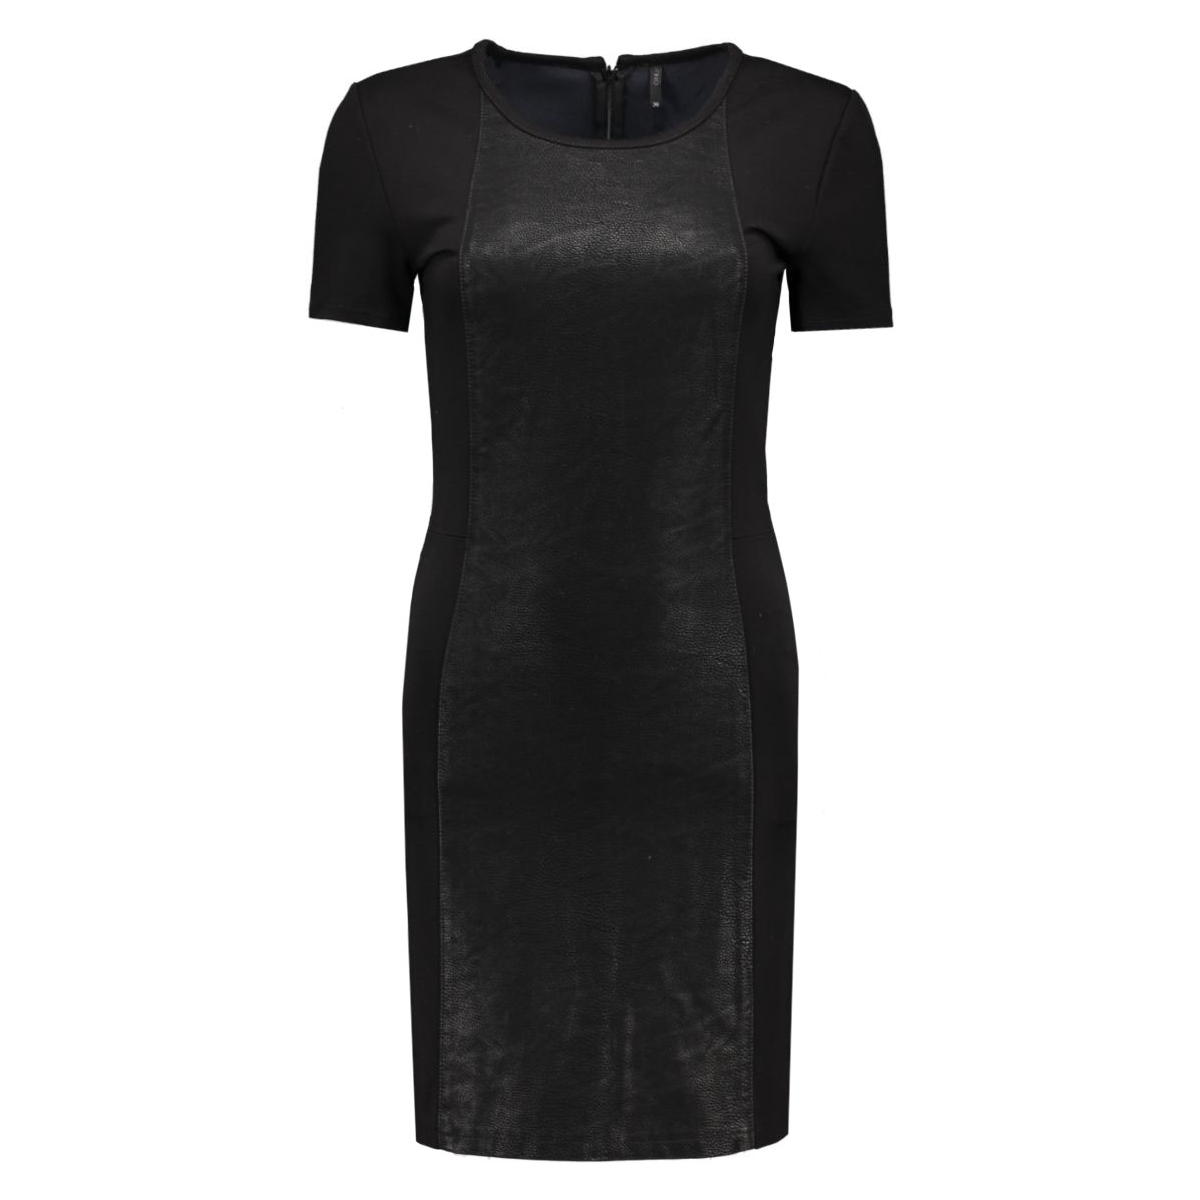 onleffort mix faux leather dress ot 15121599 only jurk black